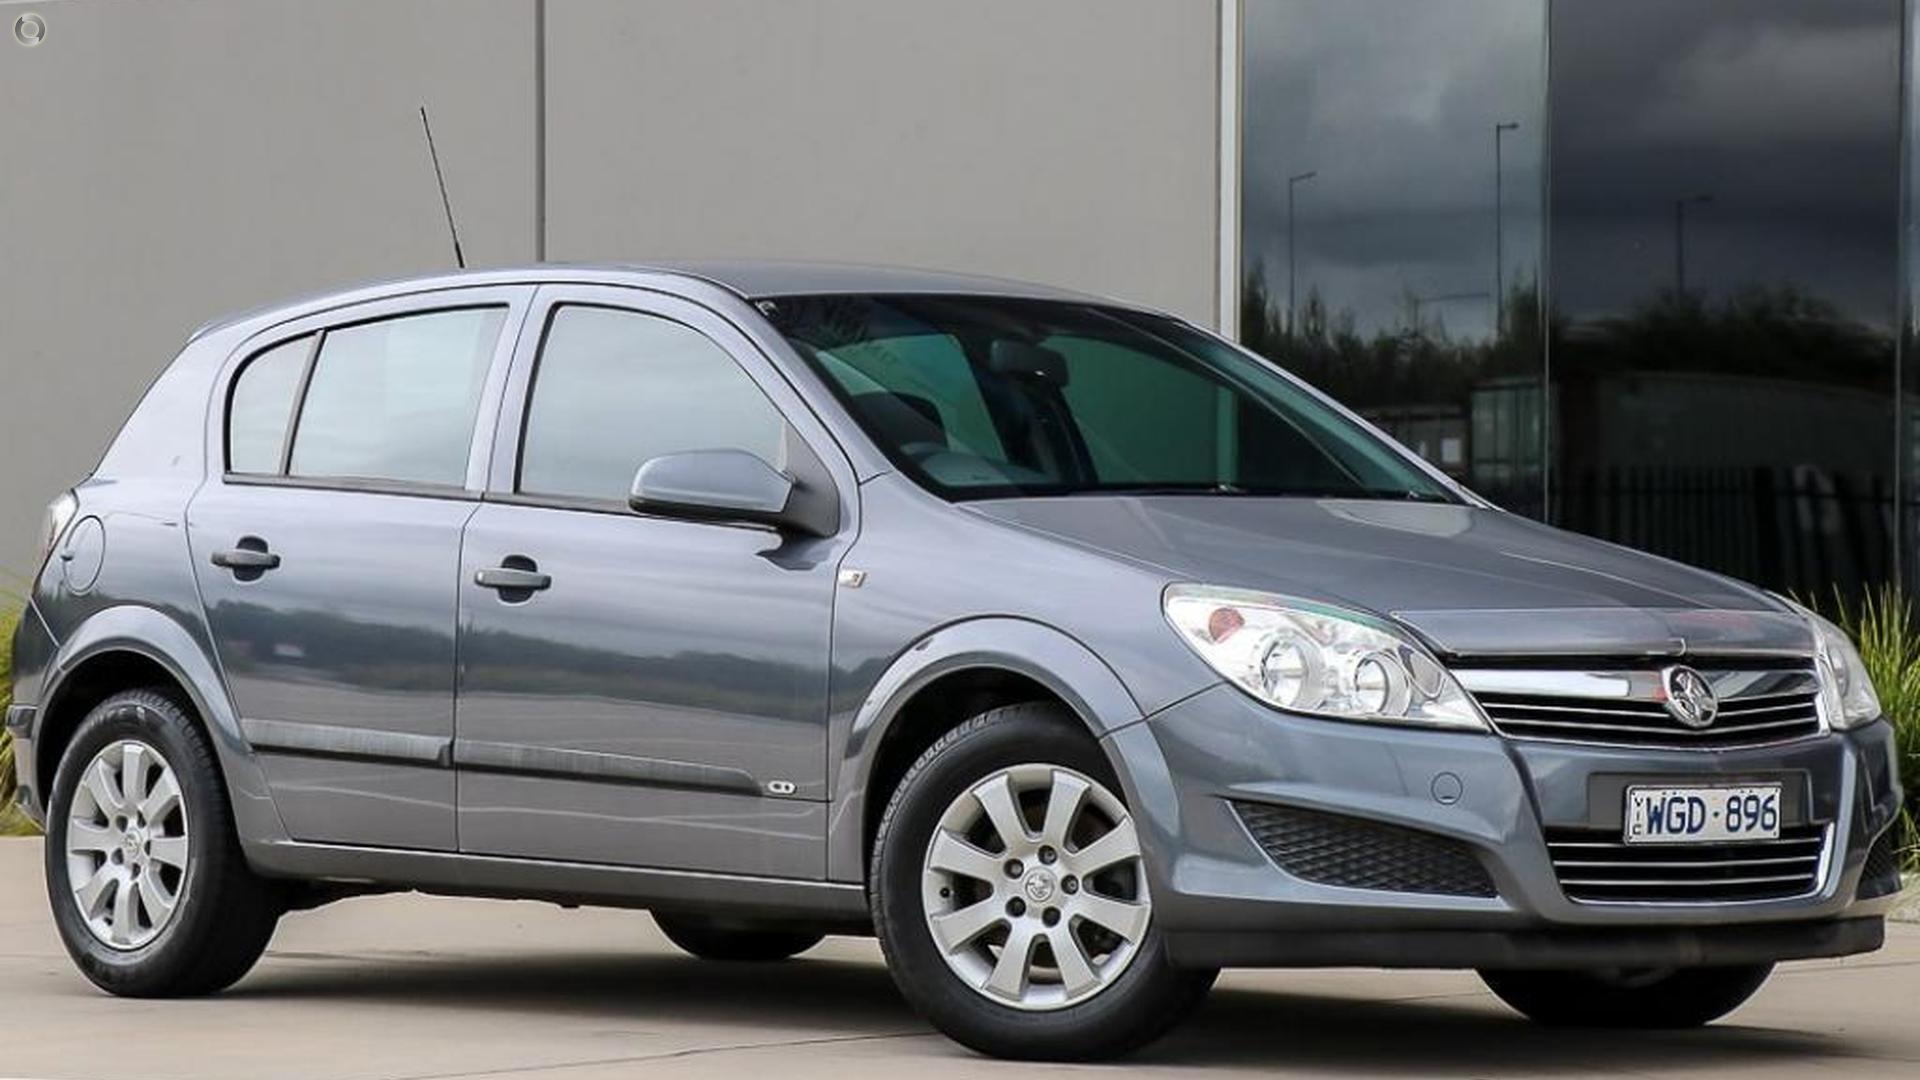 2008 Holden Astra AH